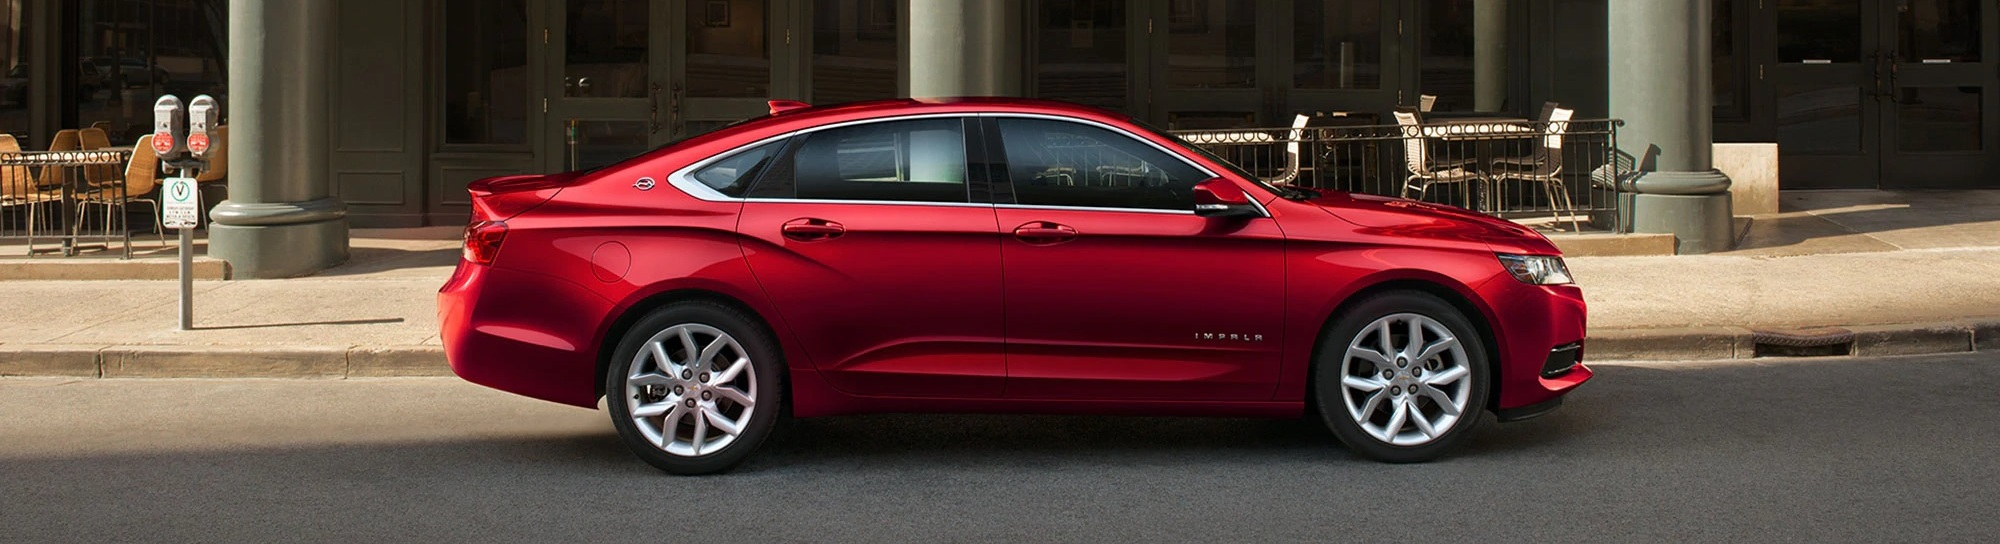 2020 Chevrolet Impala for Sale near North County, CA